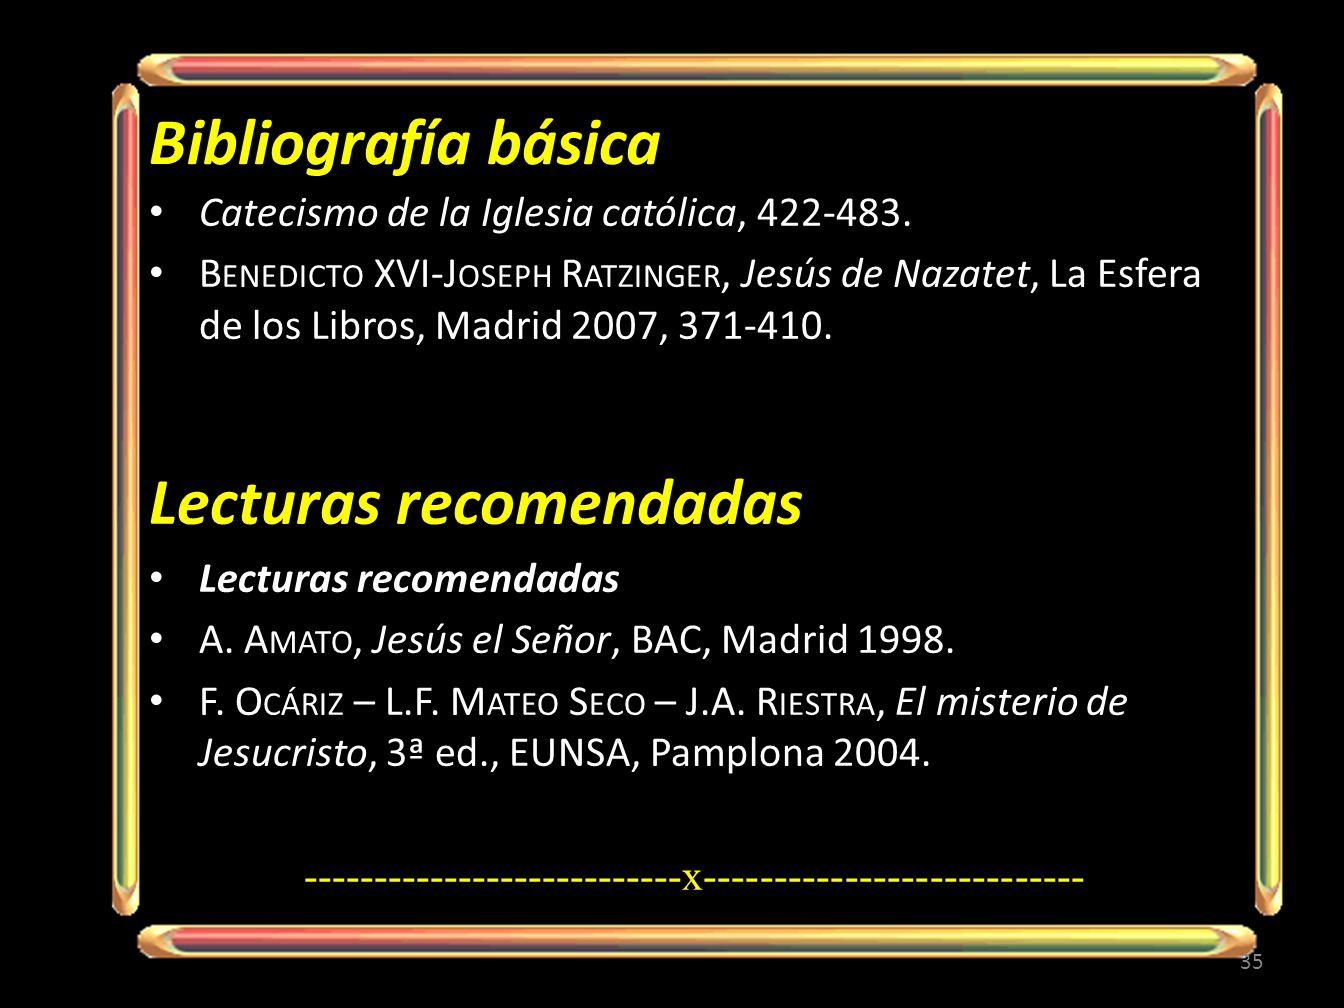 Bibliografía básica Catecismo de la Iglesia católica, 422-483. B ENEDICTO XVI-J OSEPH R ATZINGER, Jesús de Nazatet, La Esfera de los Libros, Madrid 20